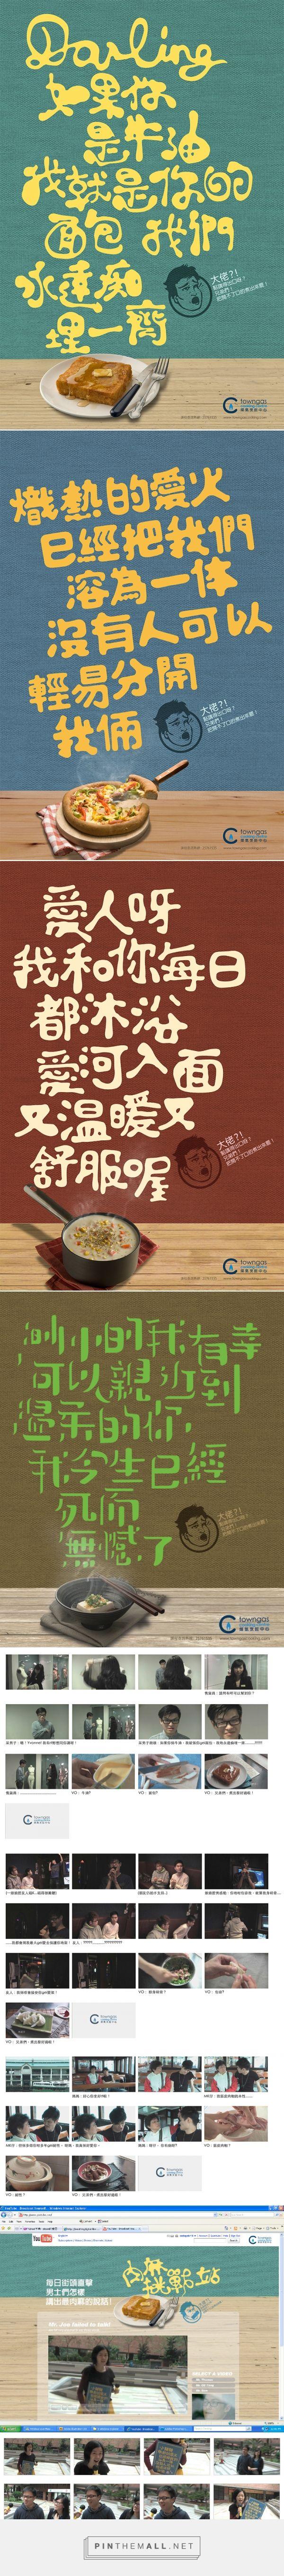 "Towngas Cooking Center - ""Hey men! Lets start cooking!"" on Behance | https://www.behance.net/gallery/26710269/Towngas-Cooking-Center-Hey-men-Lets-start-cooking - created via https://pinthemall.net"